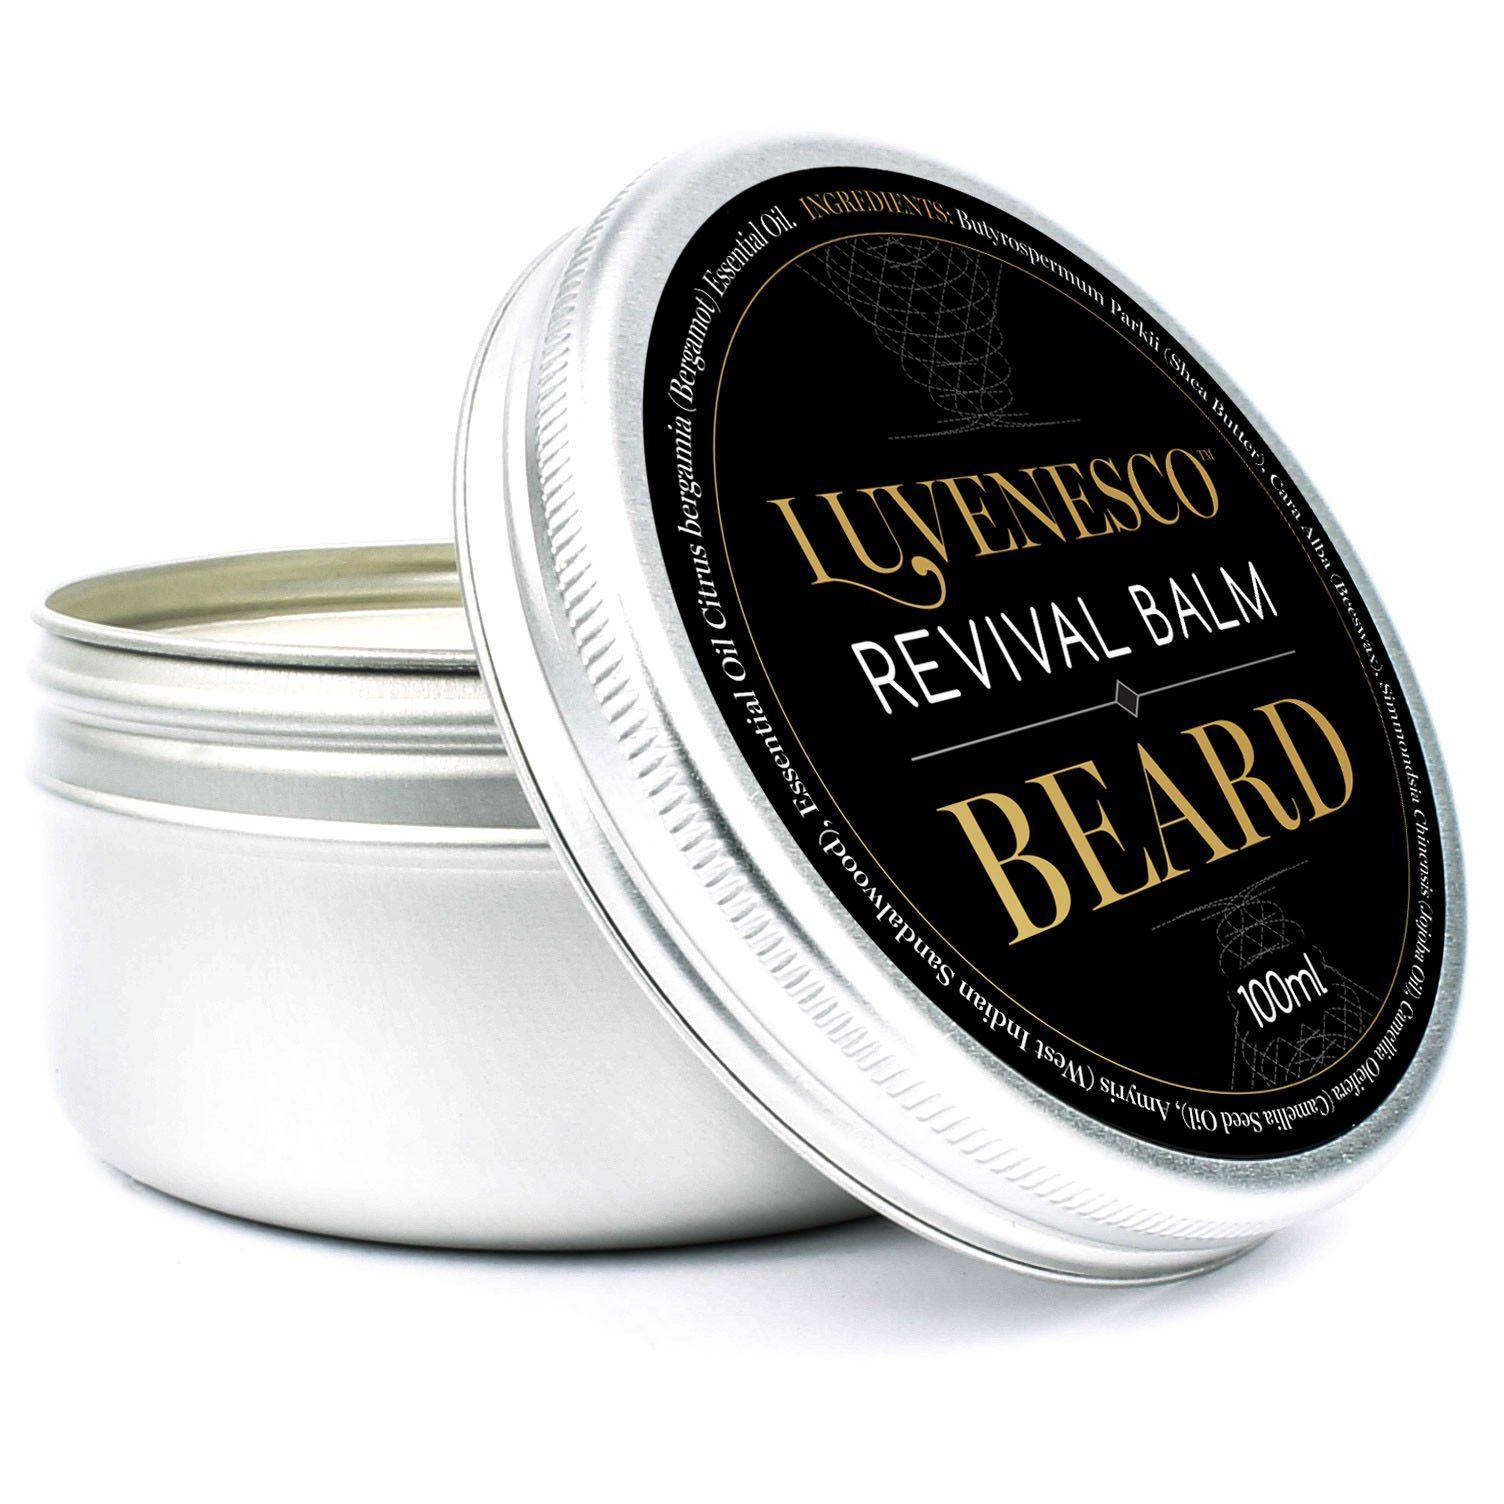 Luvenesco Beard Balm Natural Beard Care For Men Softening